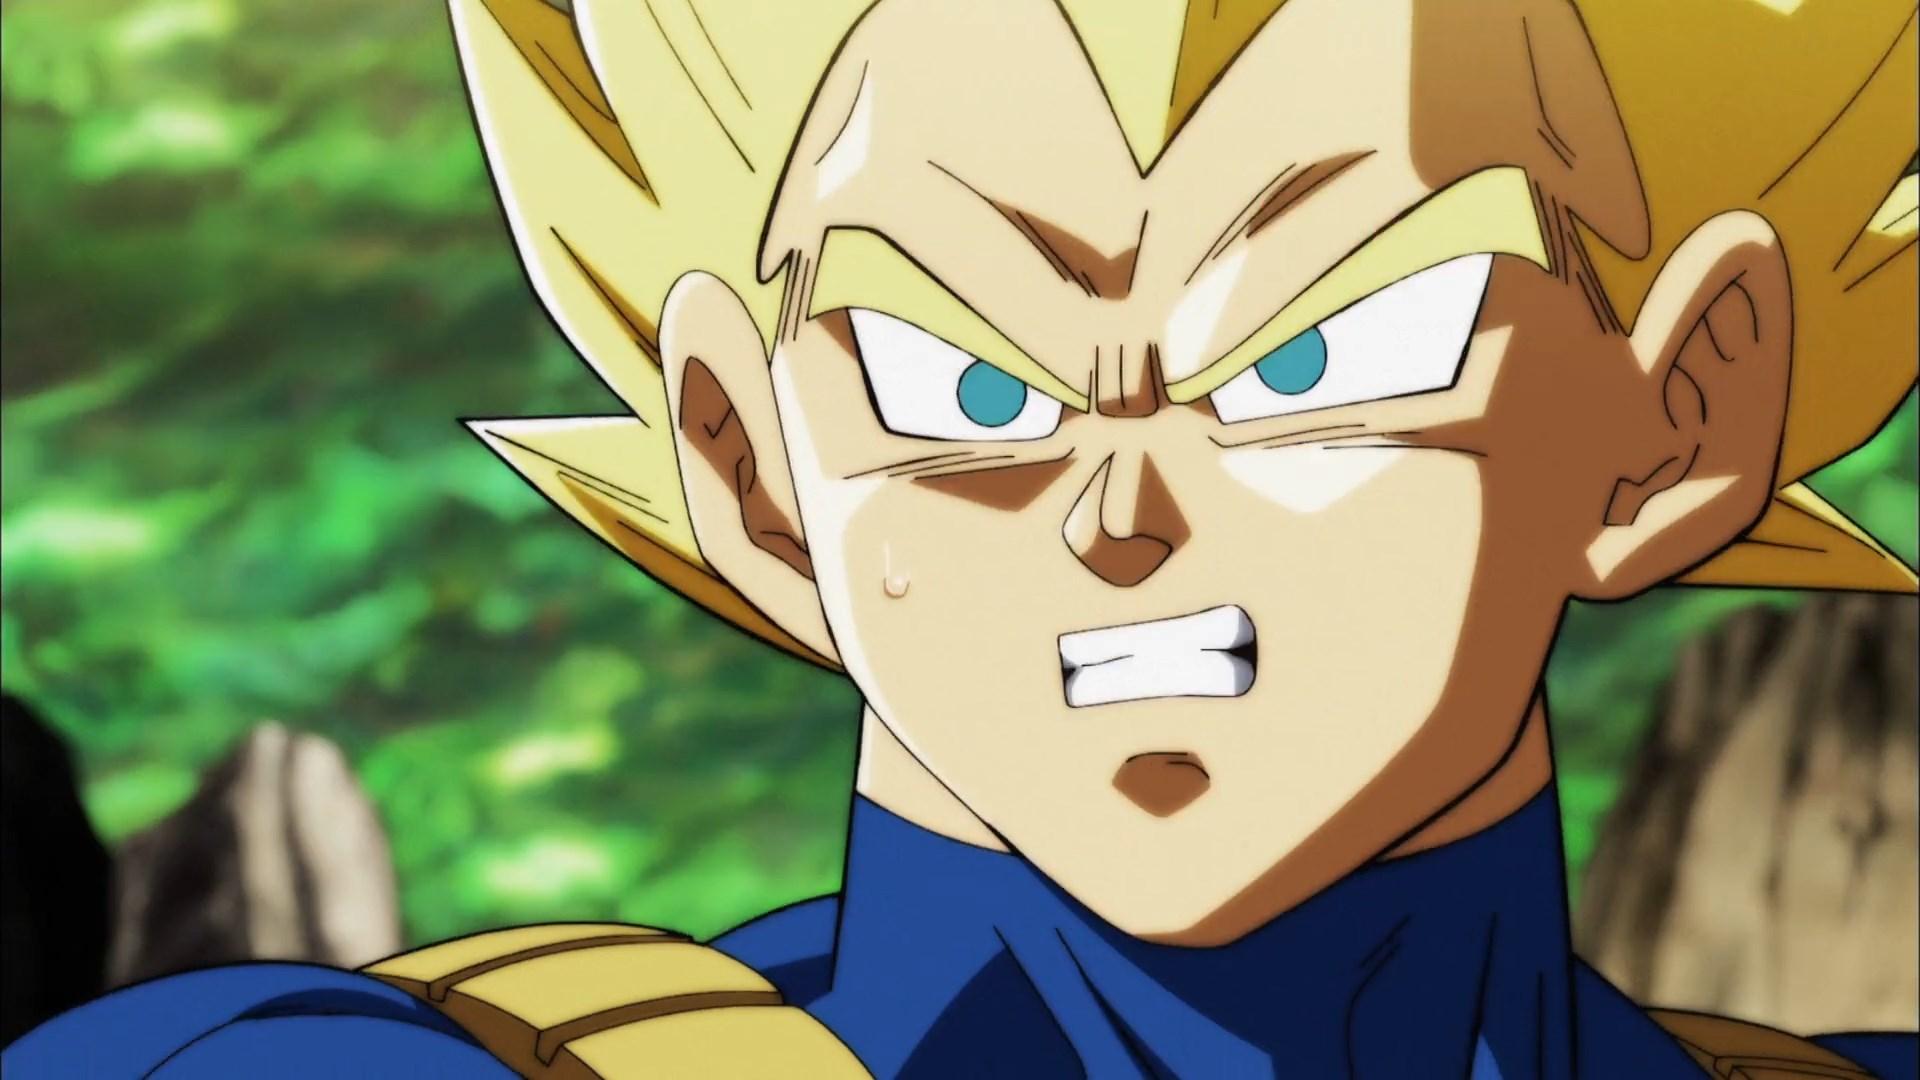 [HorribleSubs] Dragon Ball Super - 121 [1080p].mkv_snapshot_07.38